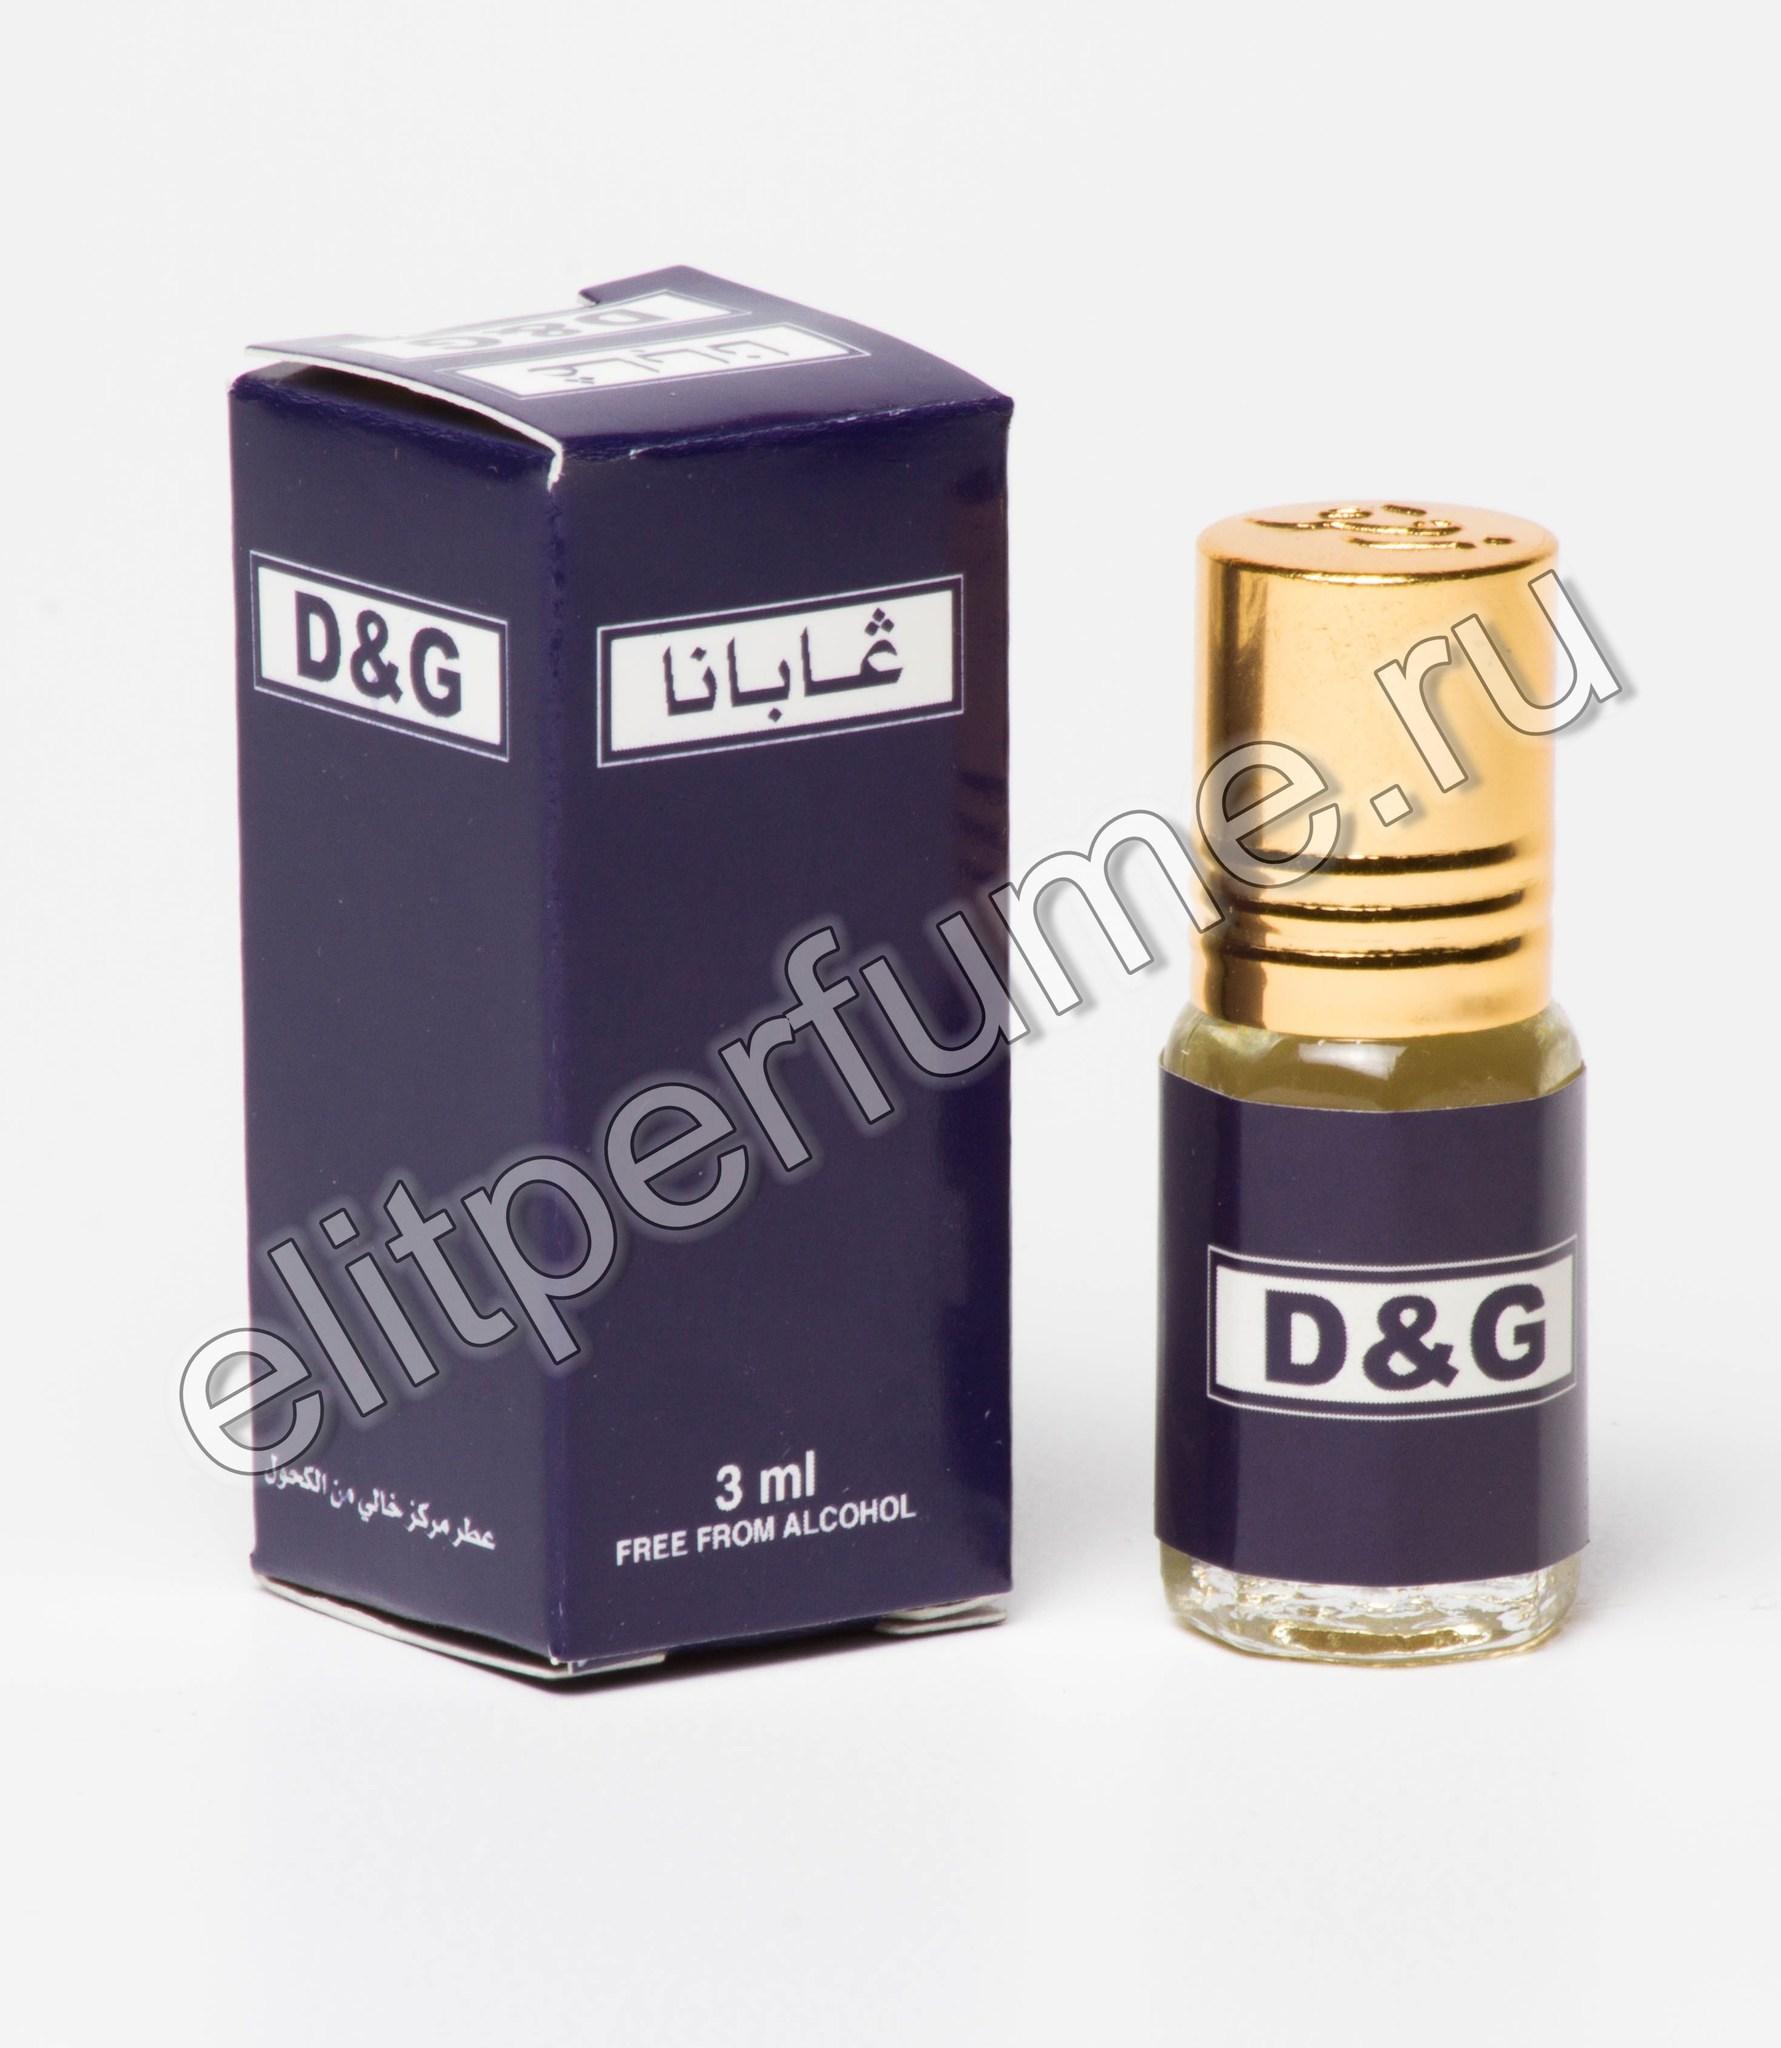 D & G 3мл арабские масляные духи от Захра Zahra Perfumes